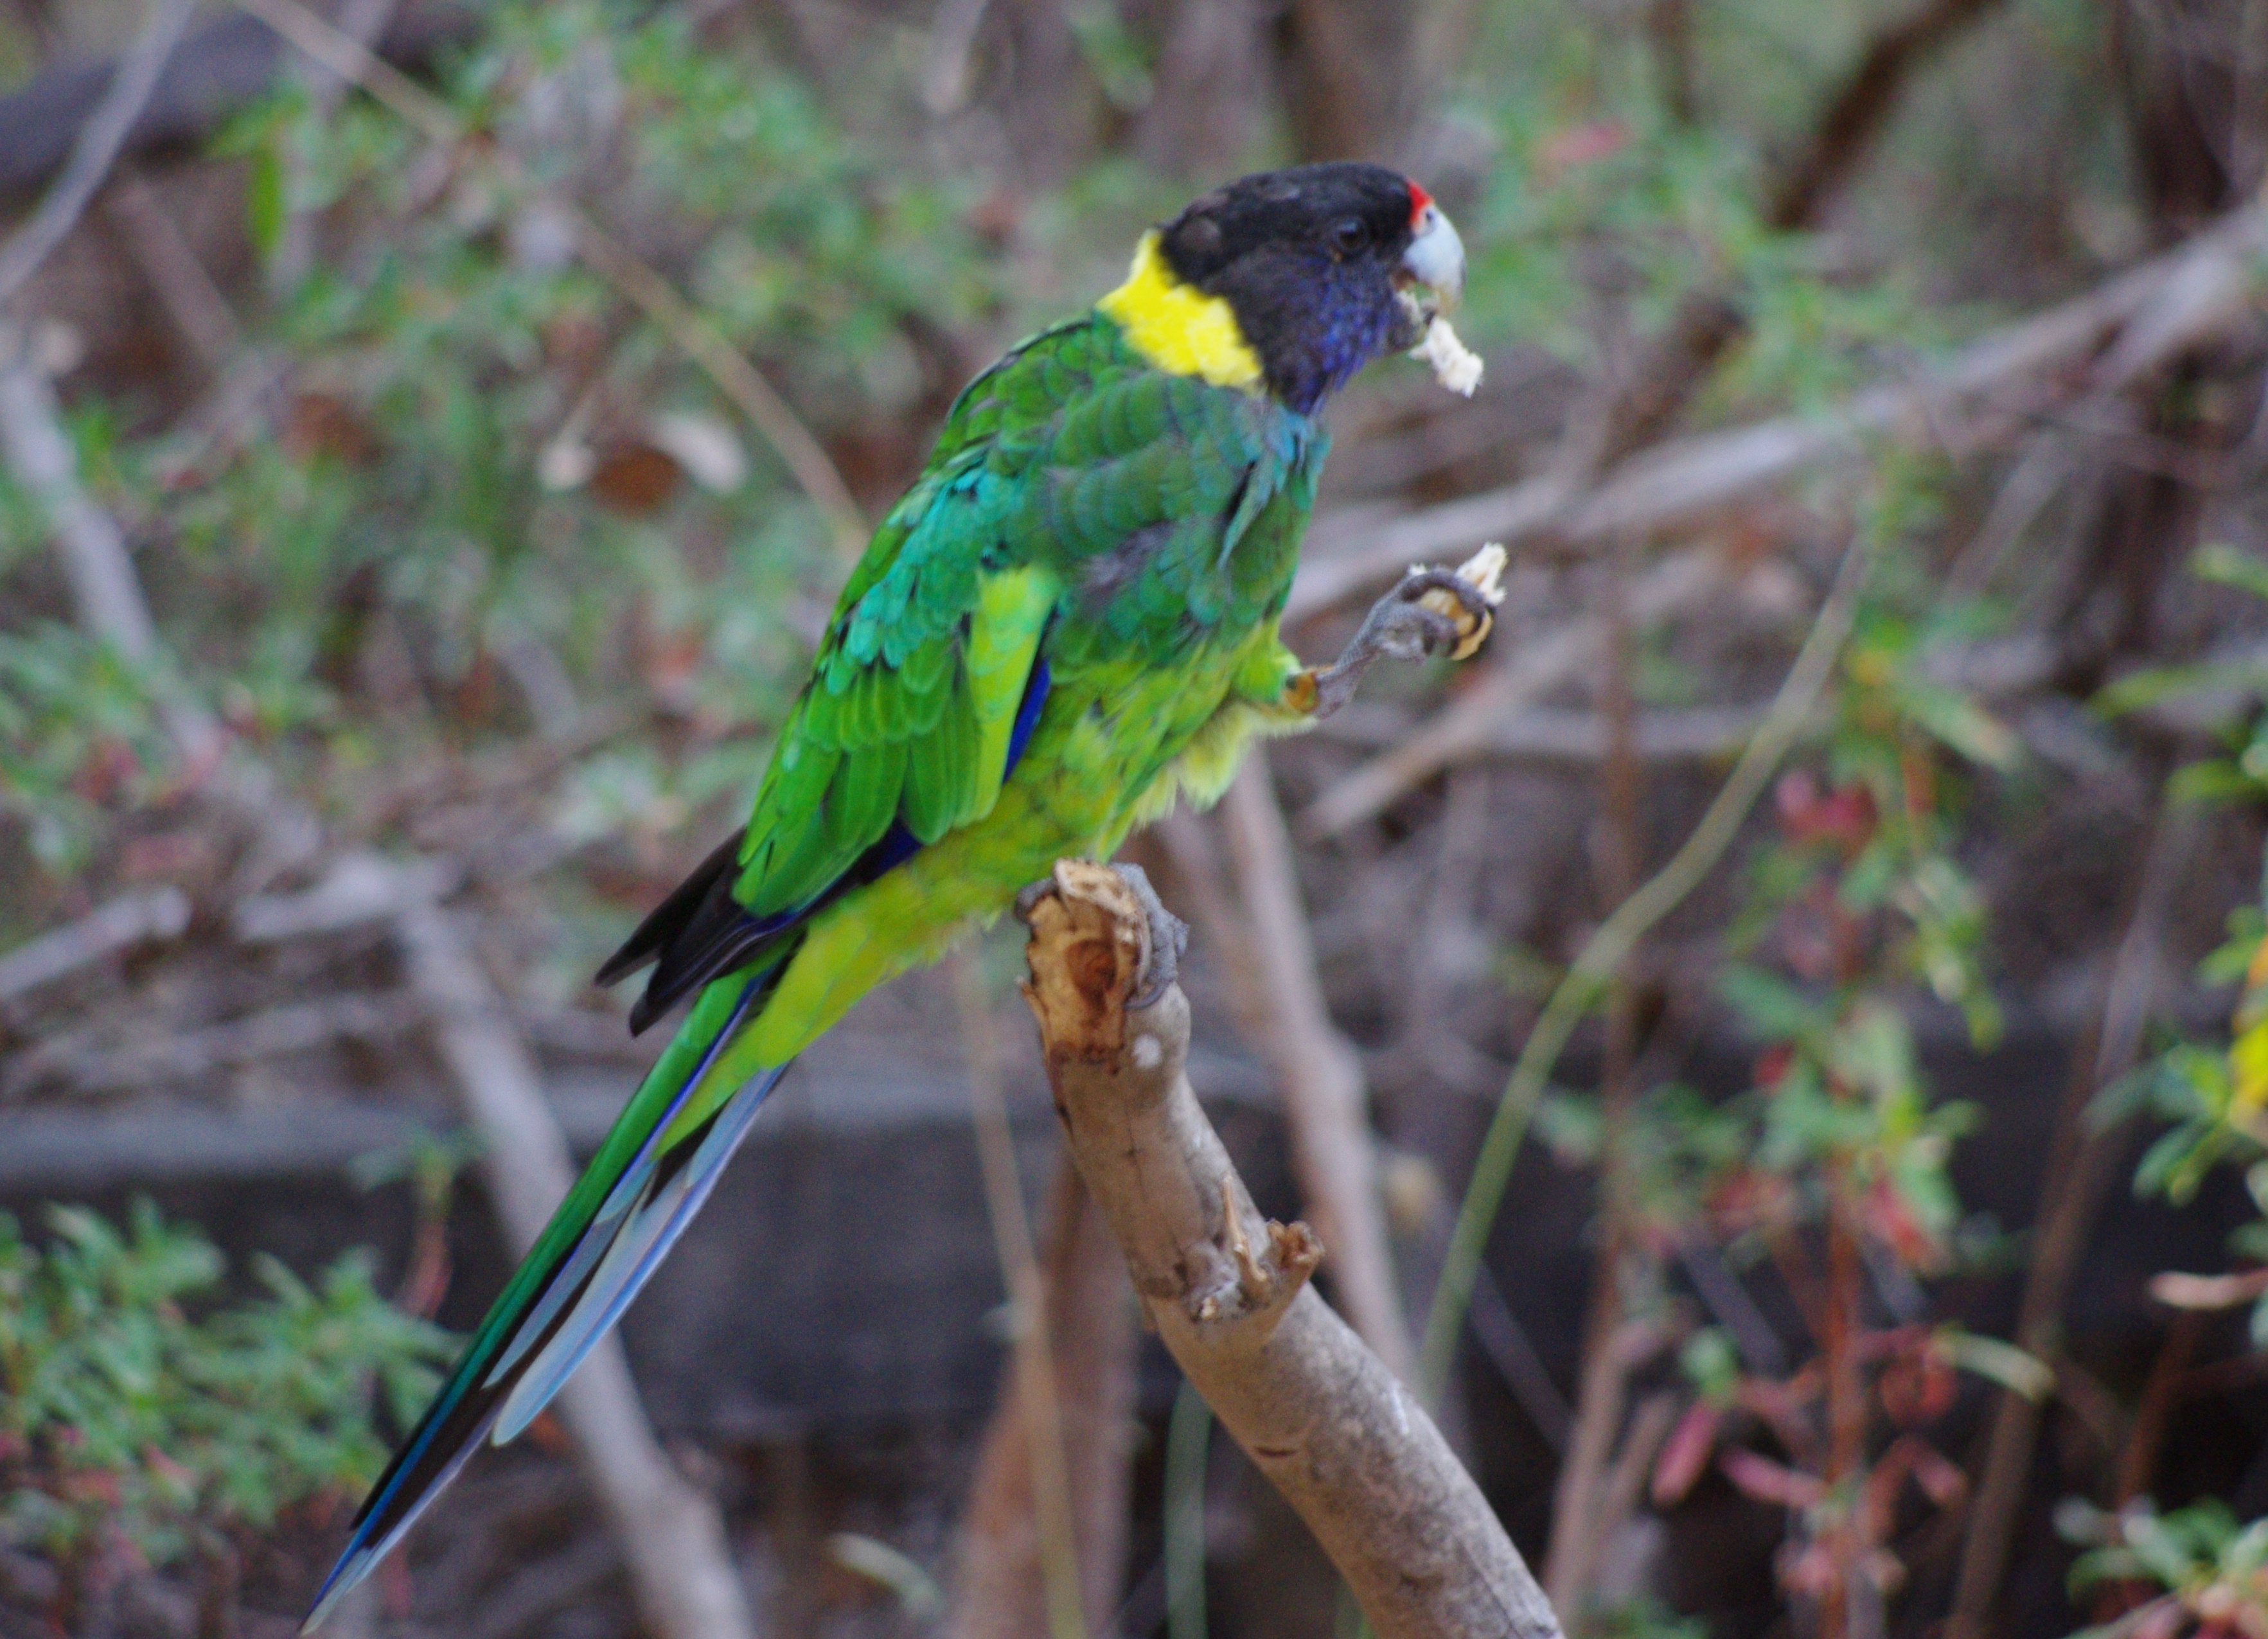 Gloucester Australia  city photos gallery : ... zonarius Gloucester National Park, Western Australia, Australia 8